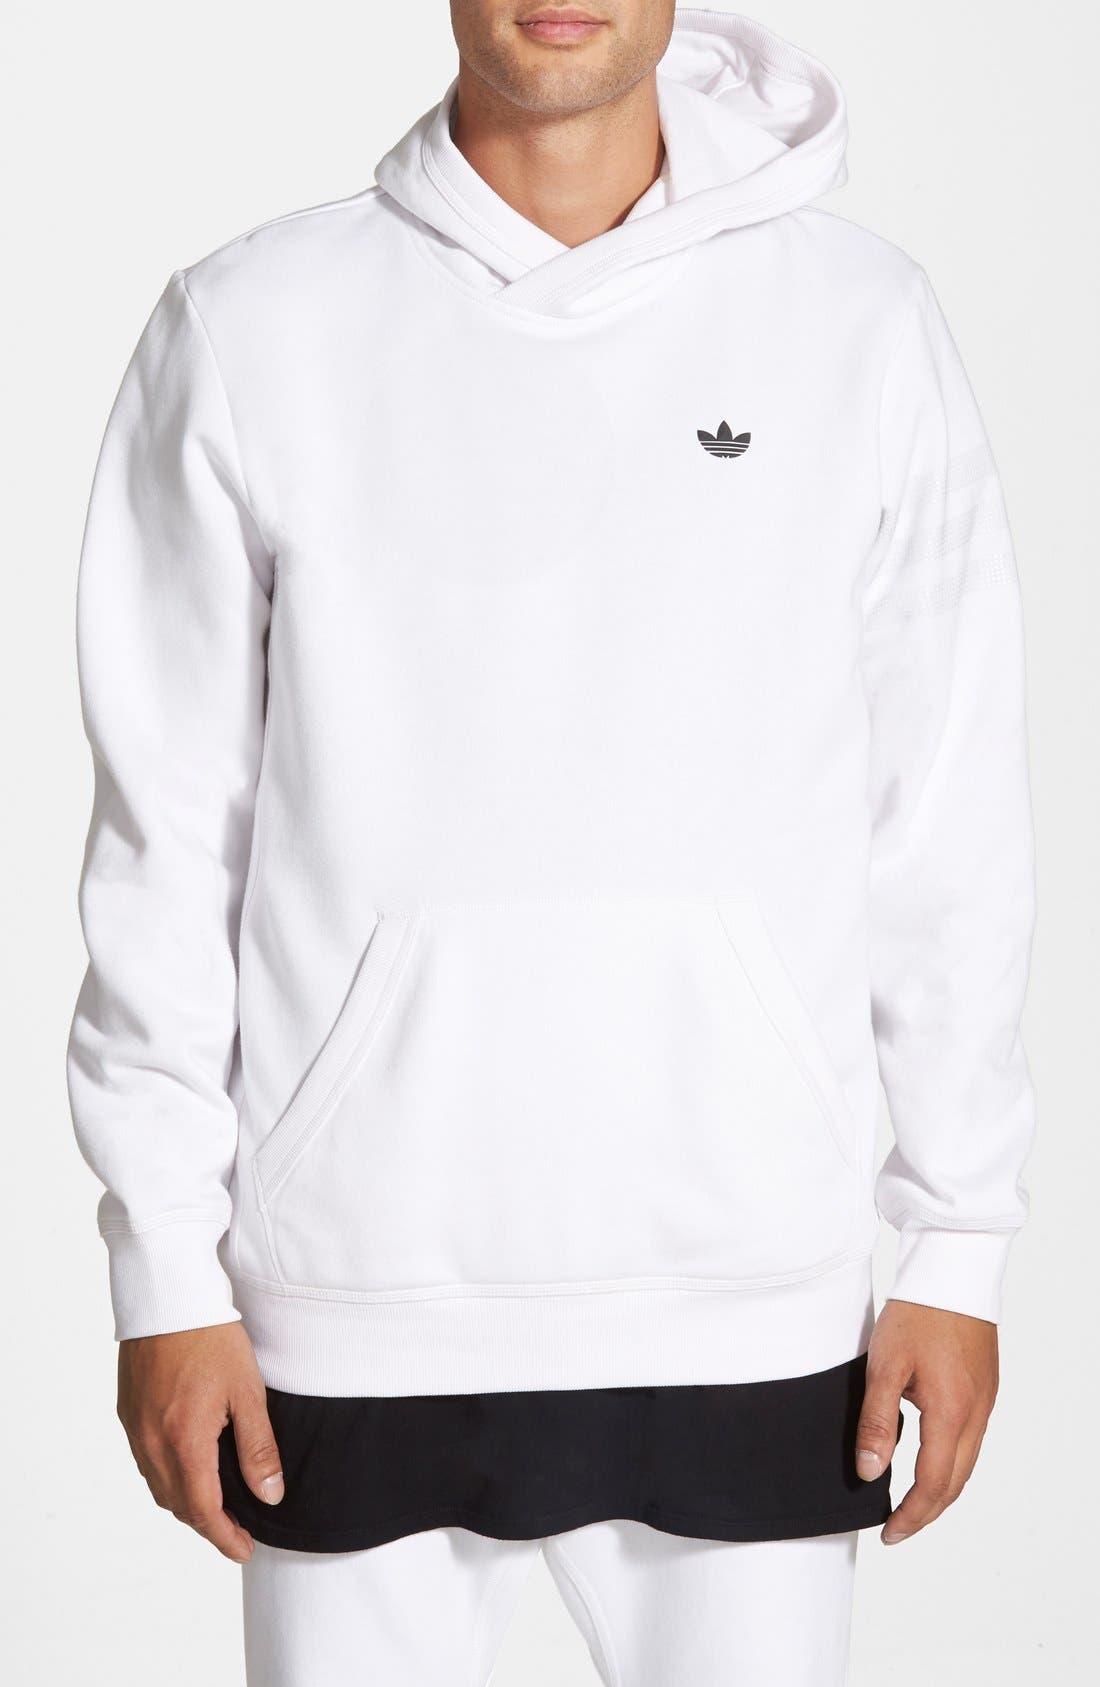 ADIDAS ORIGINALS 'Sport Luxe' Hoodie, Main, color, 100